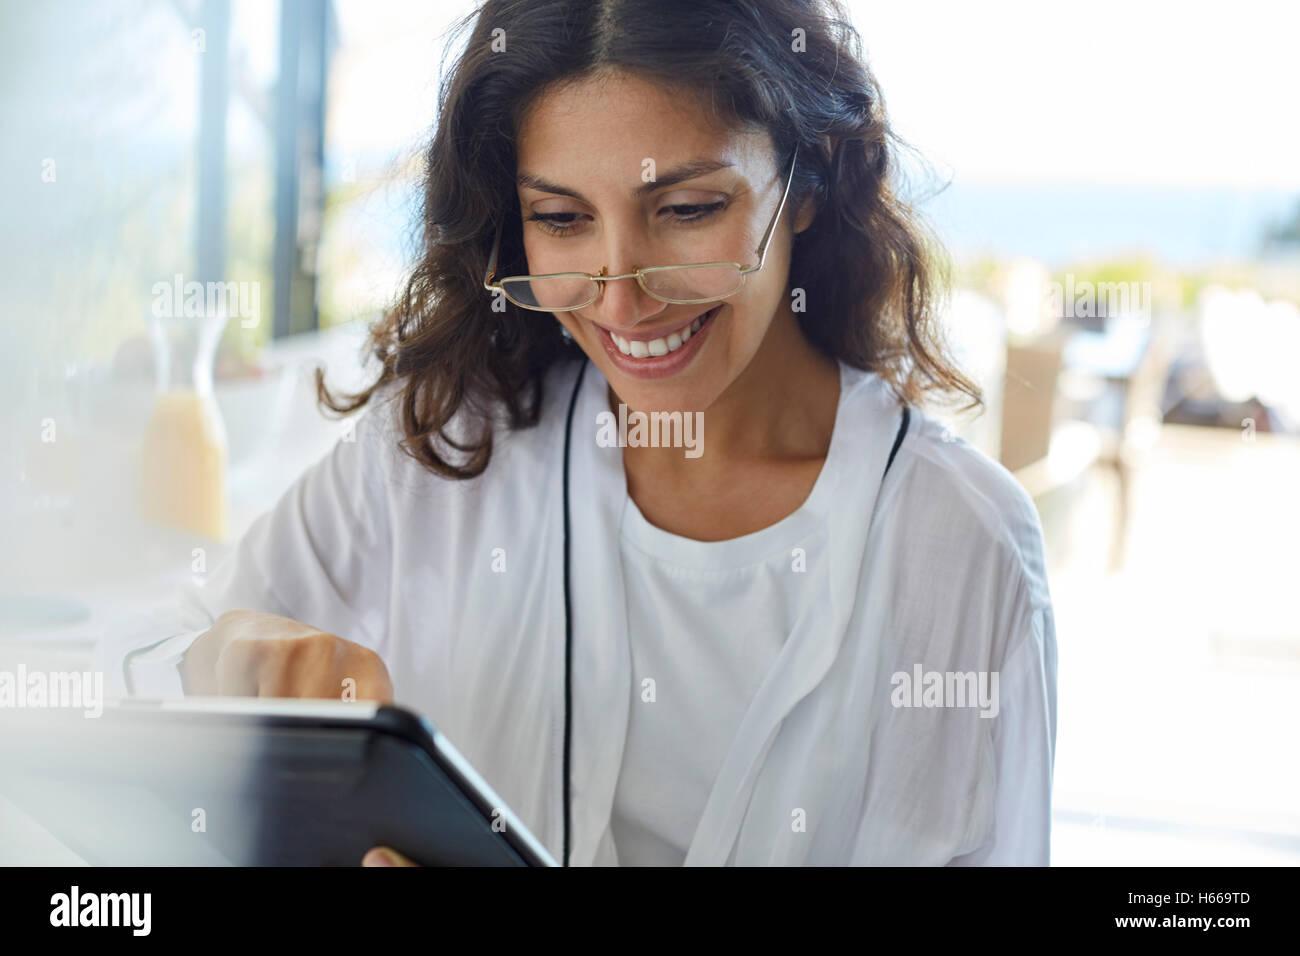 Lächelnde Frau im Bademantel mit digital-Tablette Stockfoto